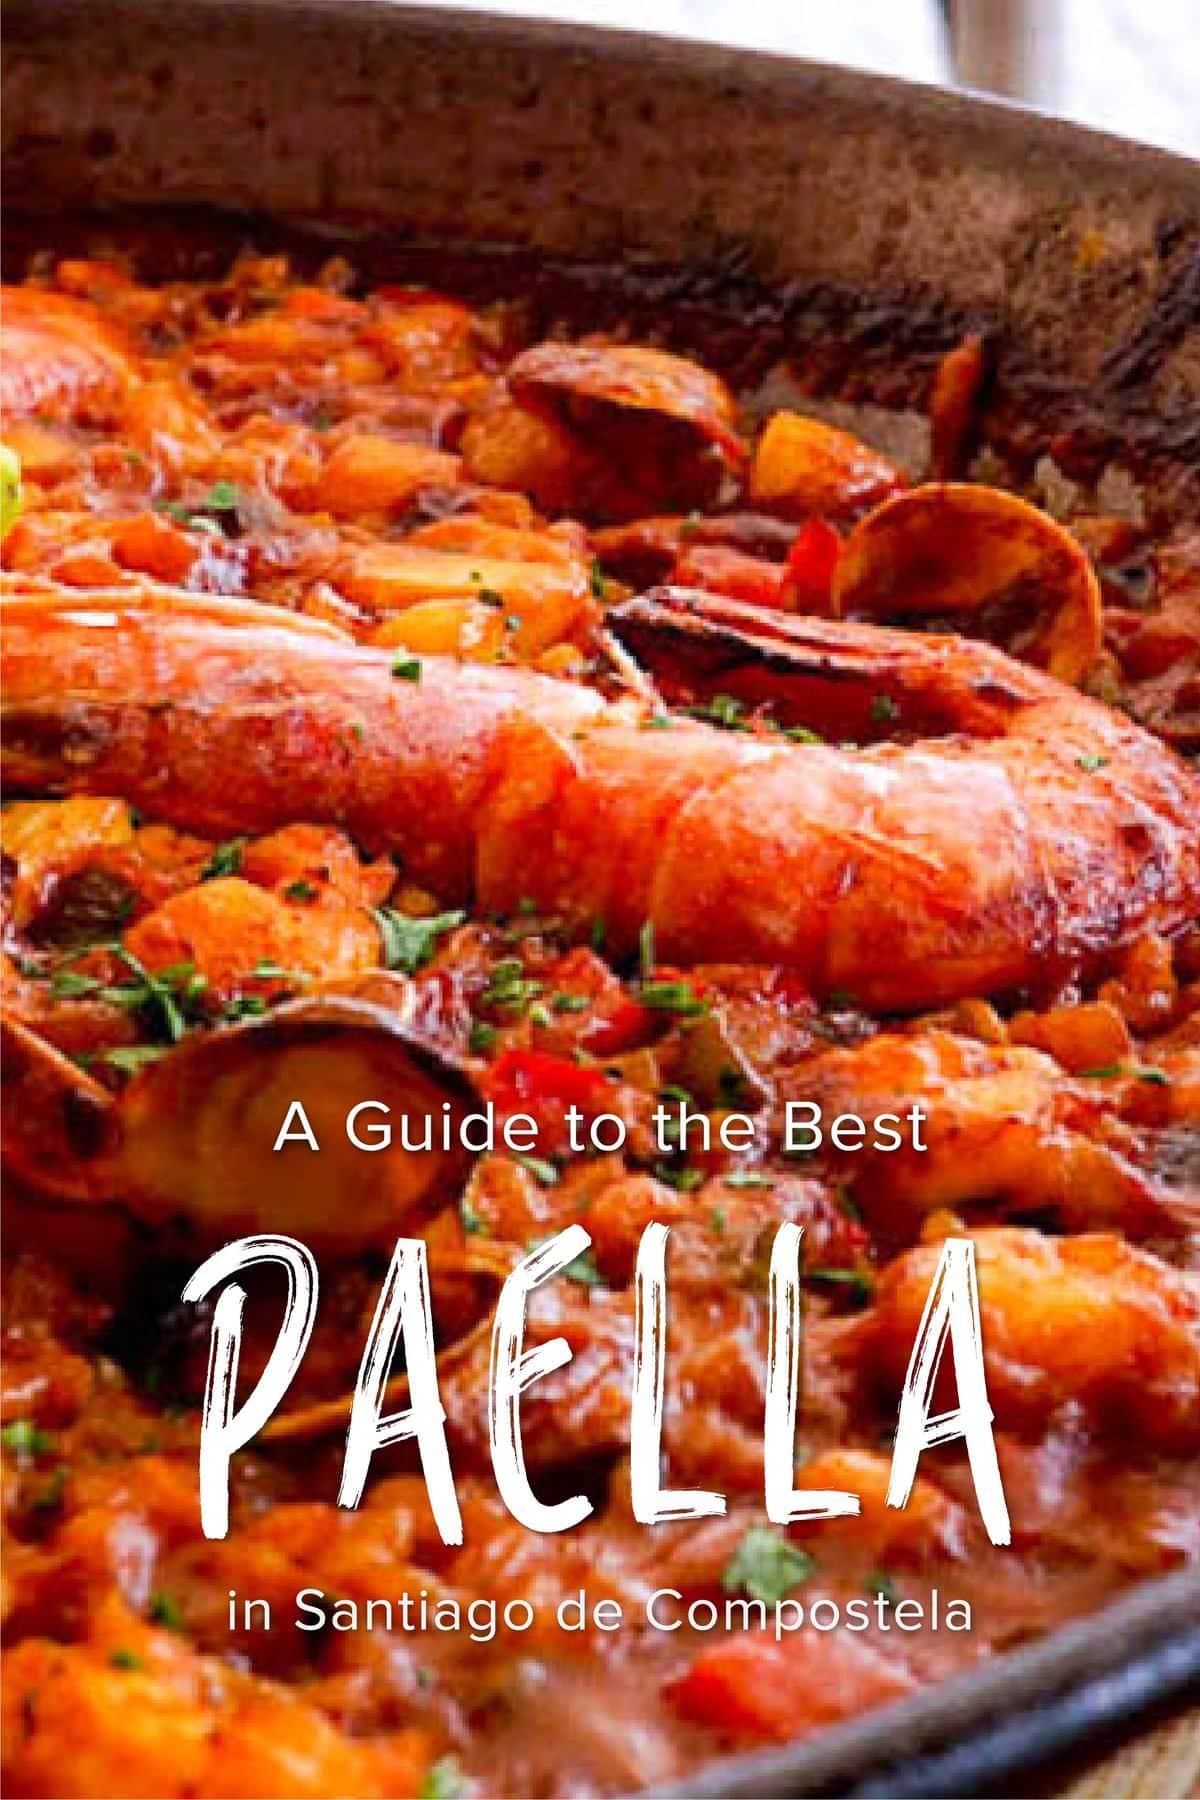 Though originally from Valencia, you can find paella in Santiago de Compostela, too!